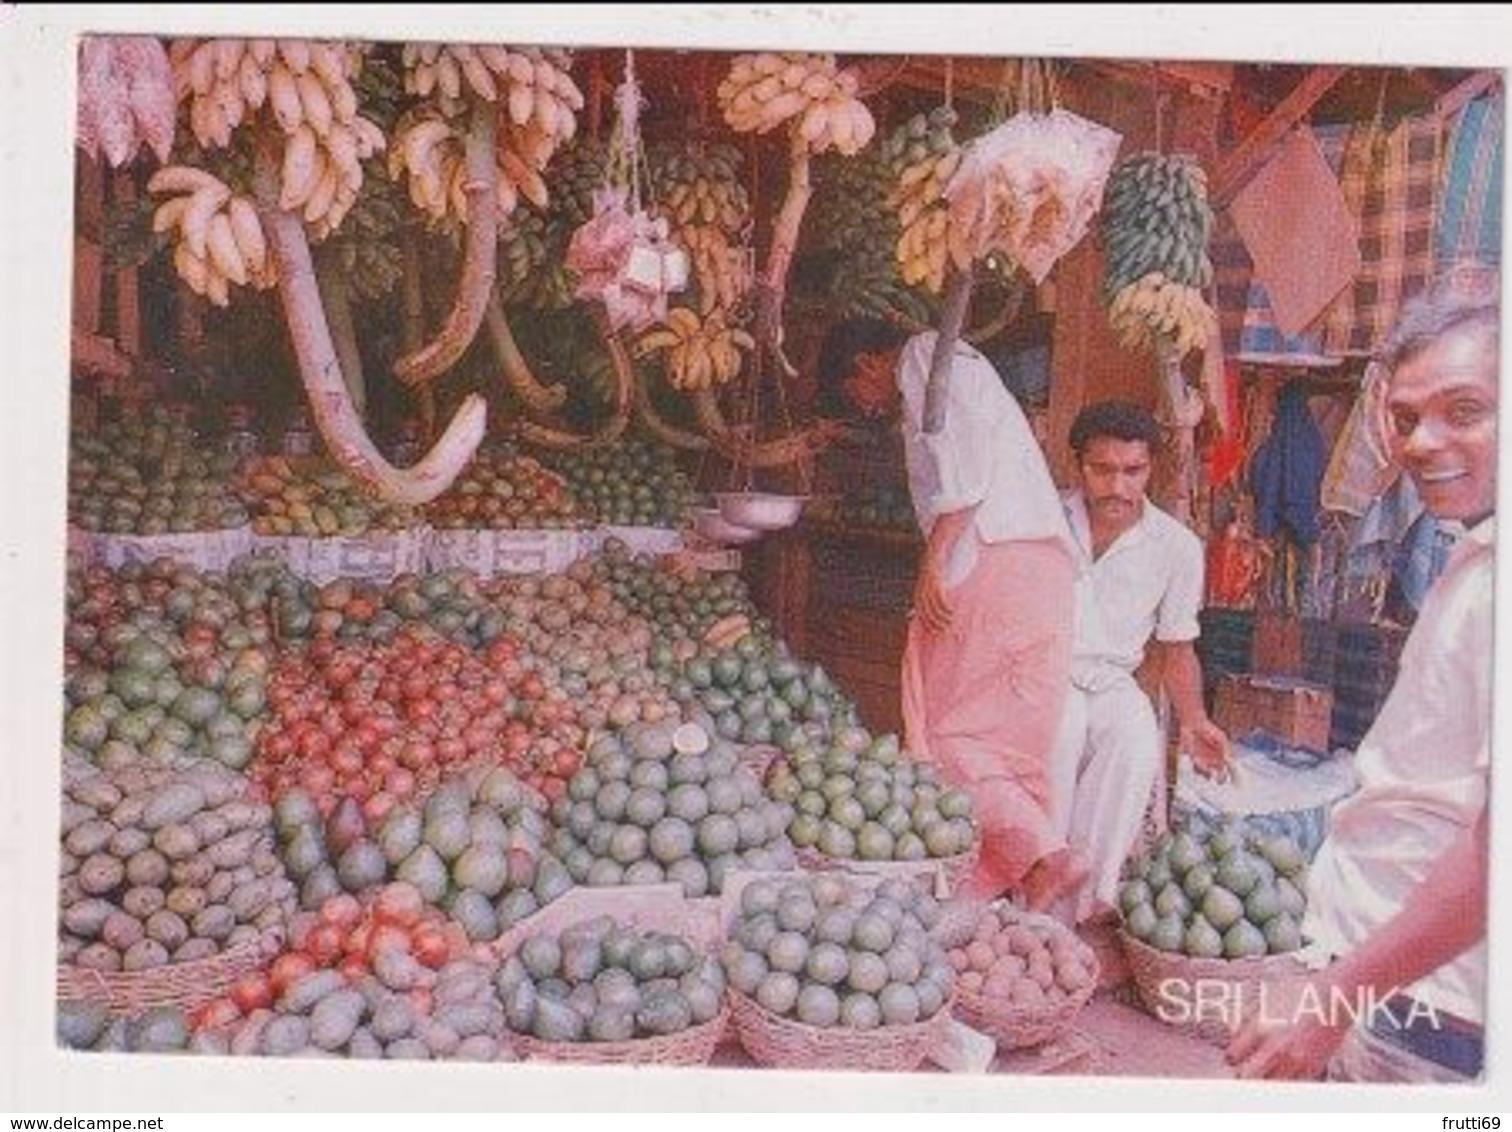 SRI LANKA - AK 381500 Fruit Stall - Sri Lanka (Ceilán)